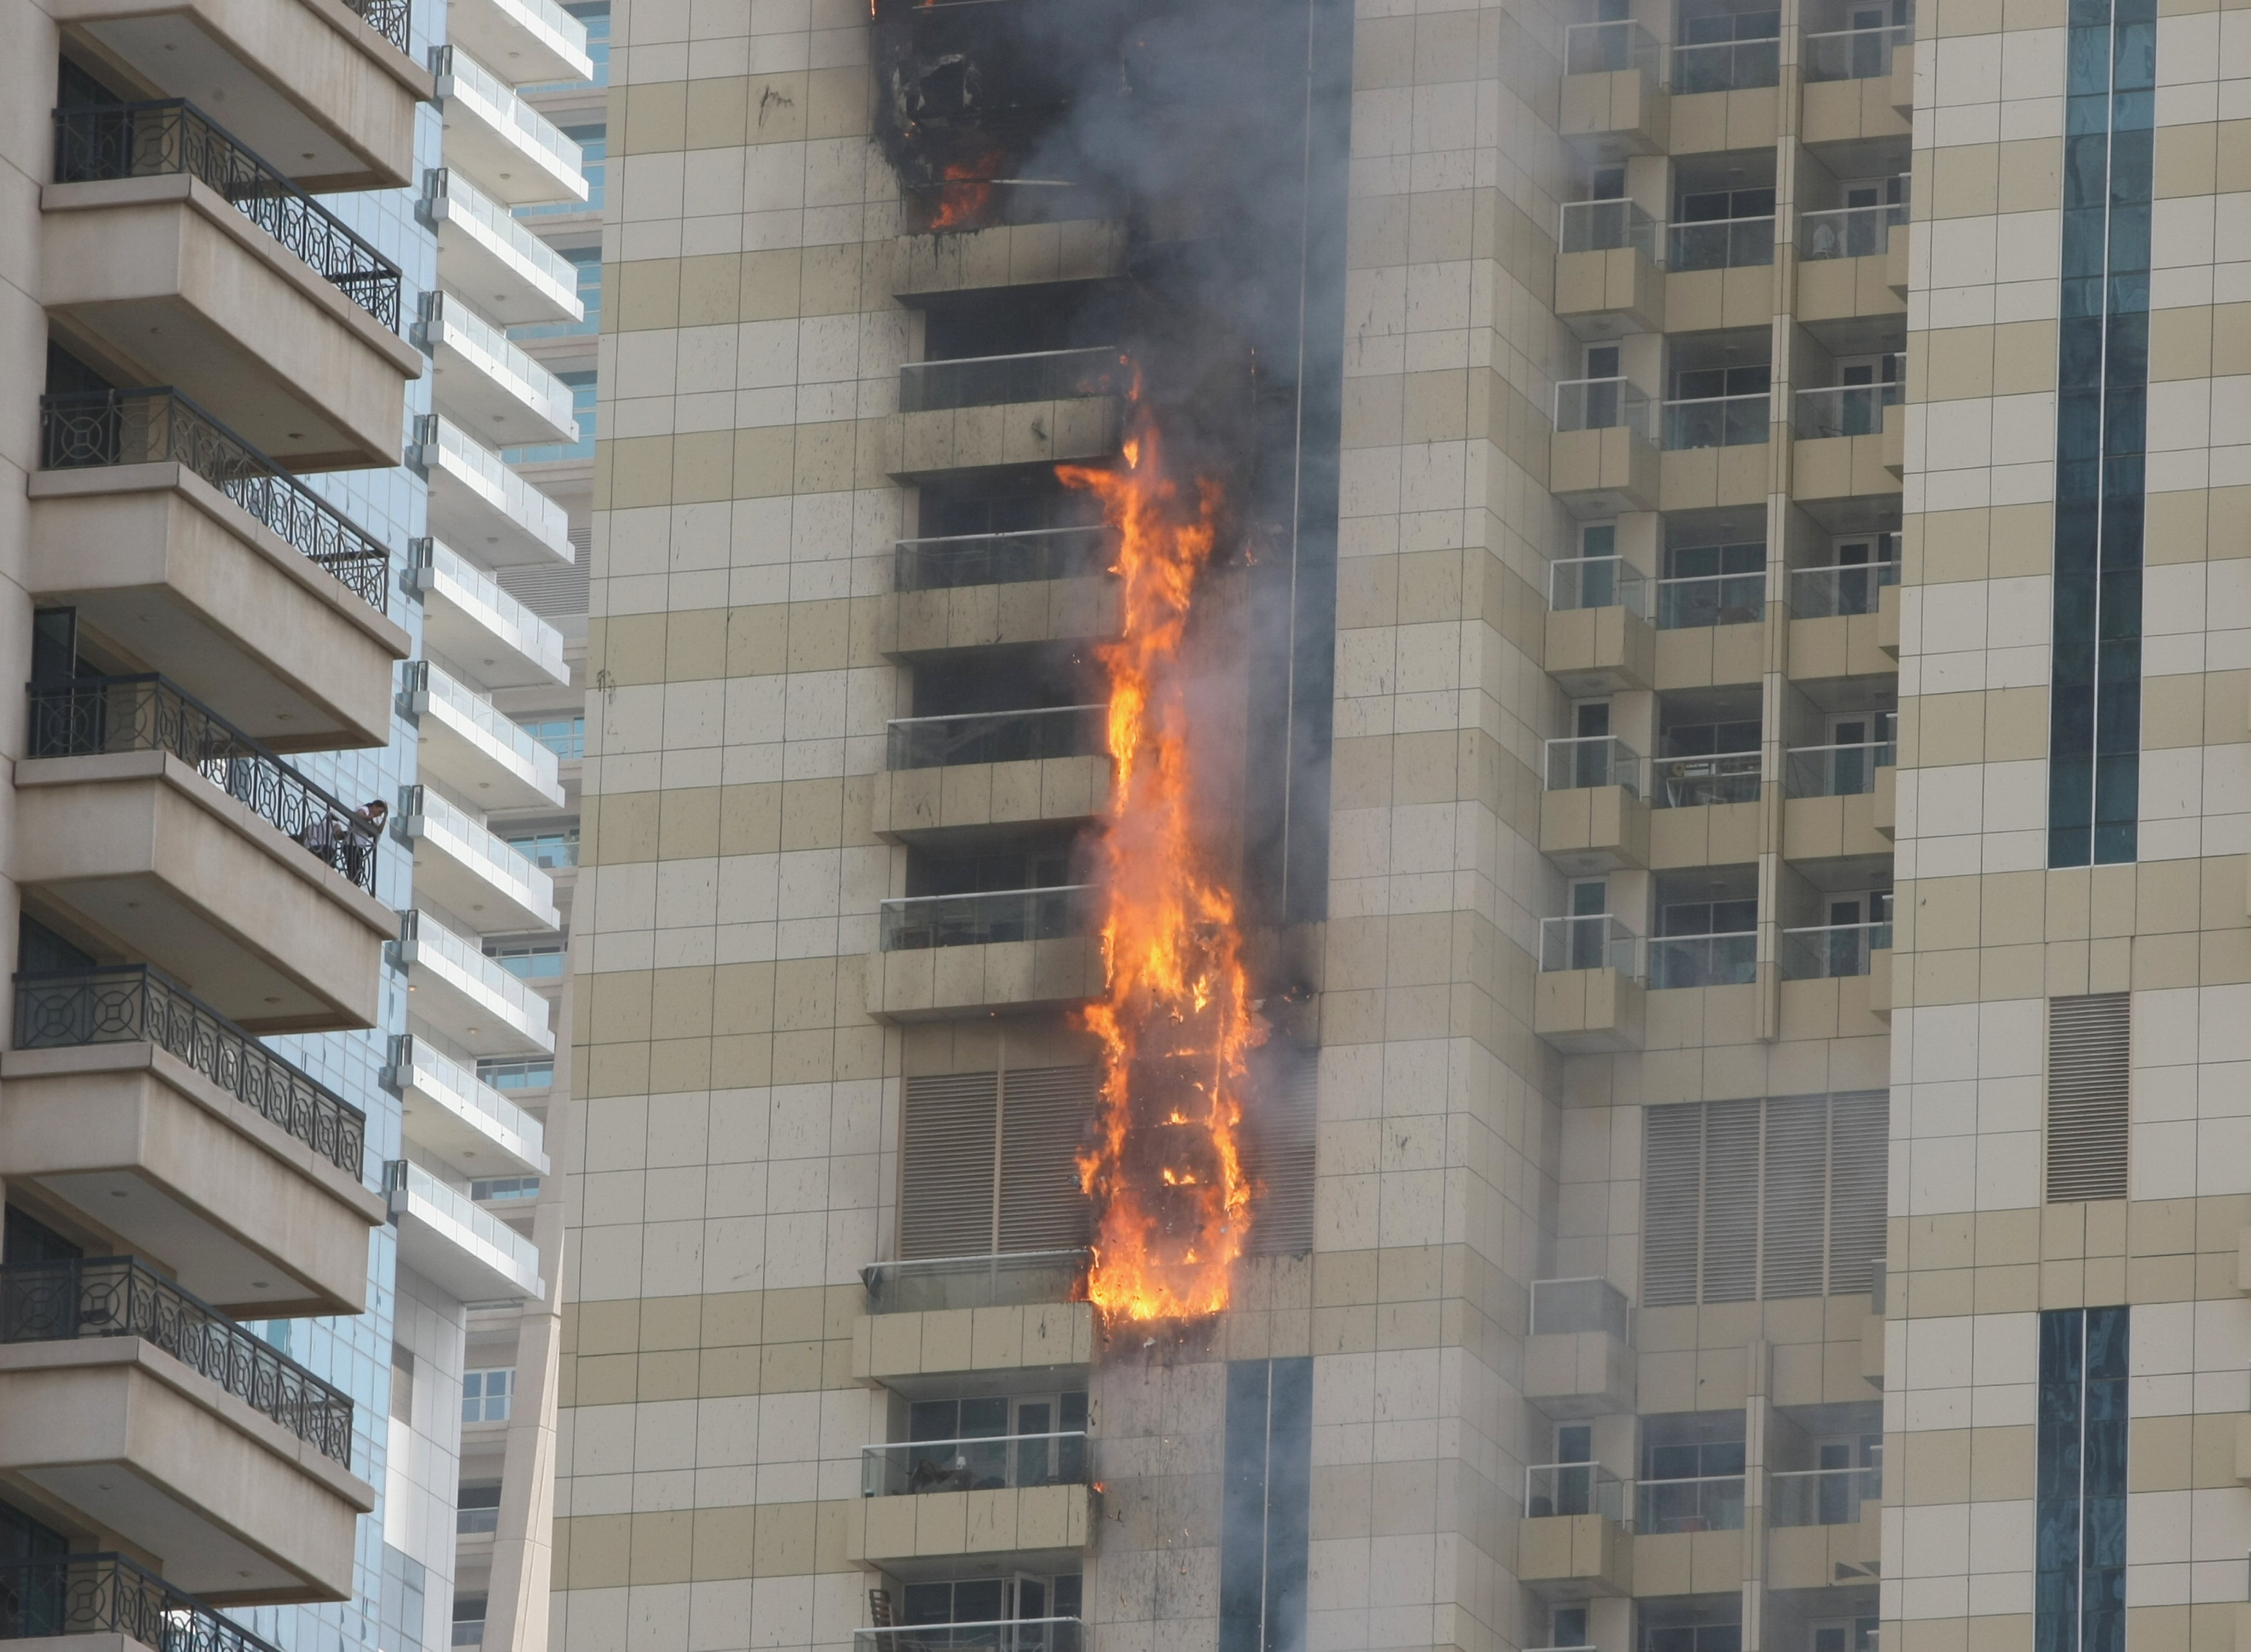 Dubai Skyscraper Fire Extinguished After Flames Char 30